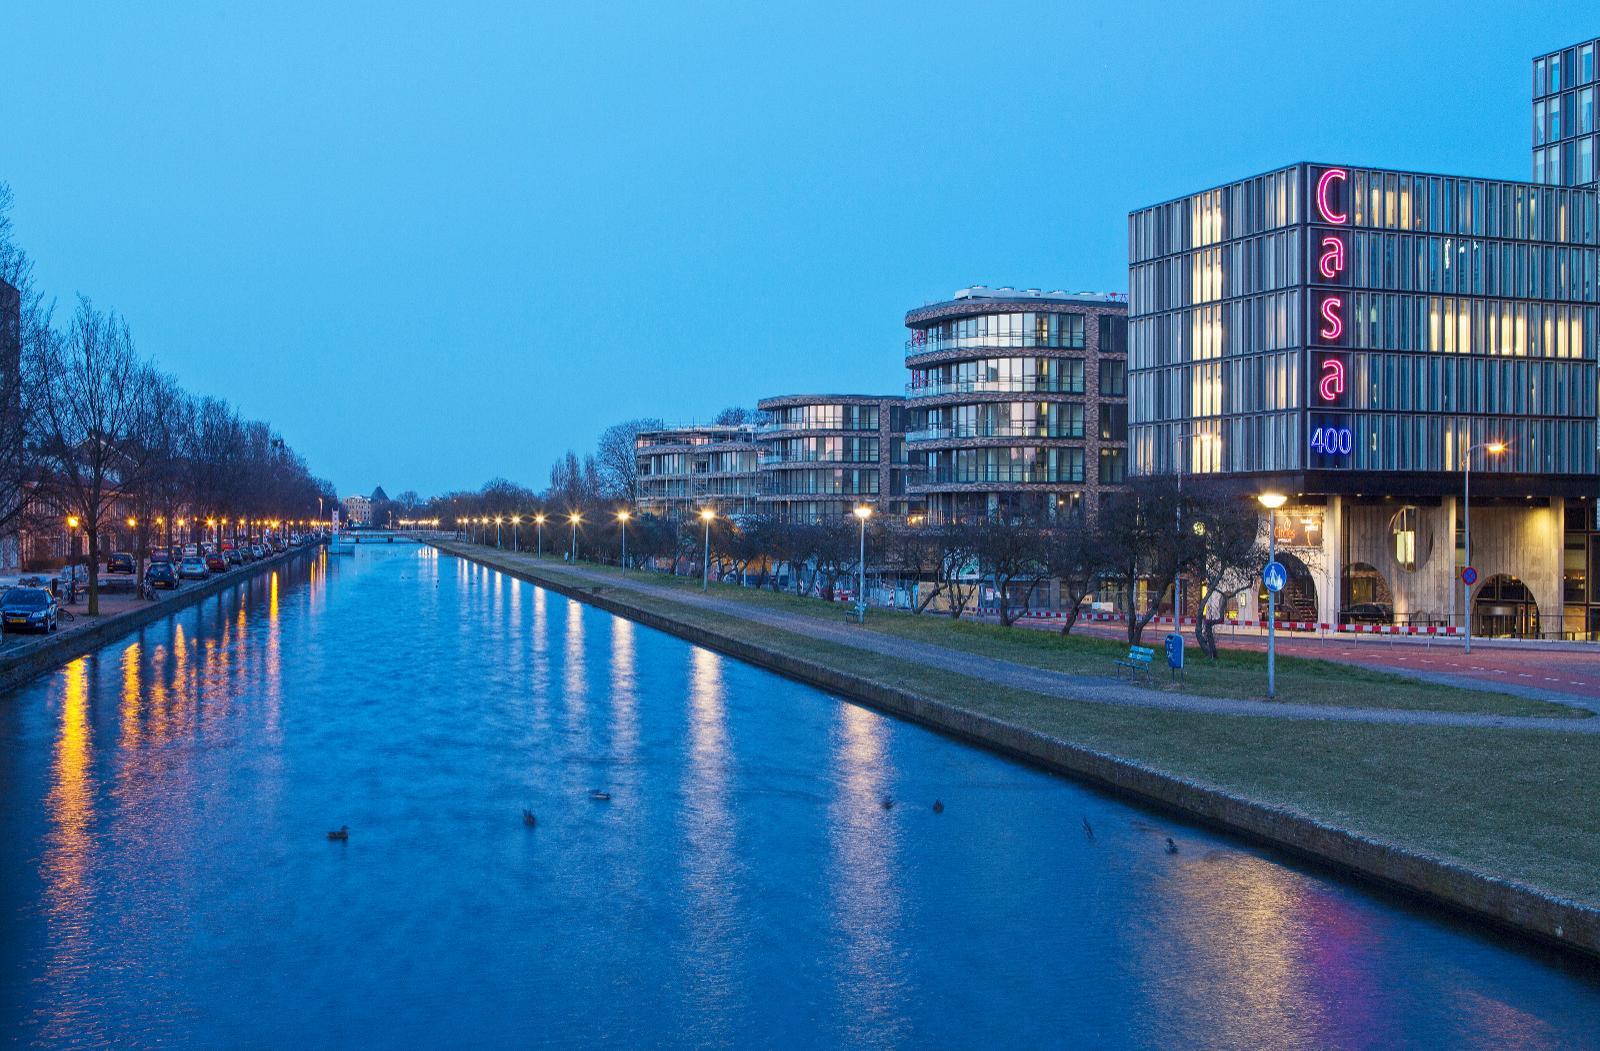 Copyright - Hotel Casa 400 Amsterdam